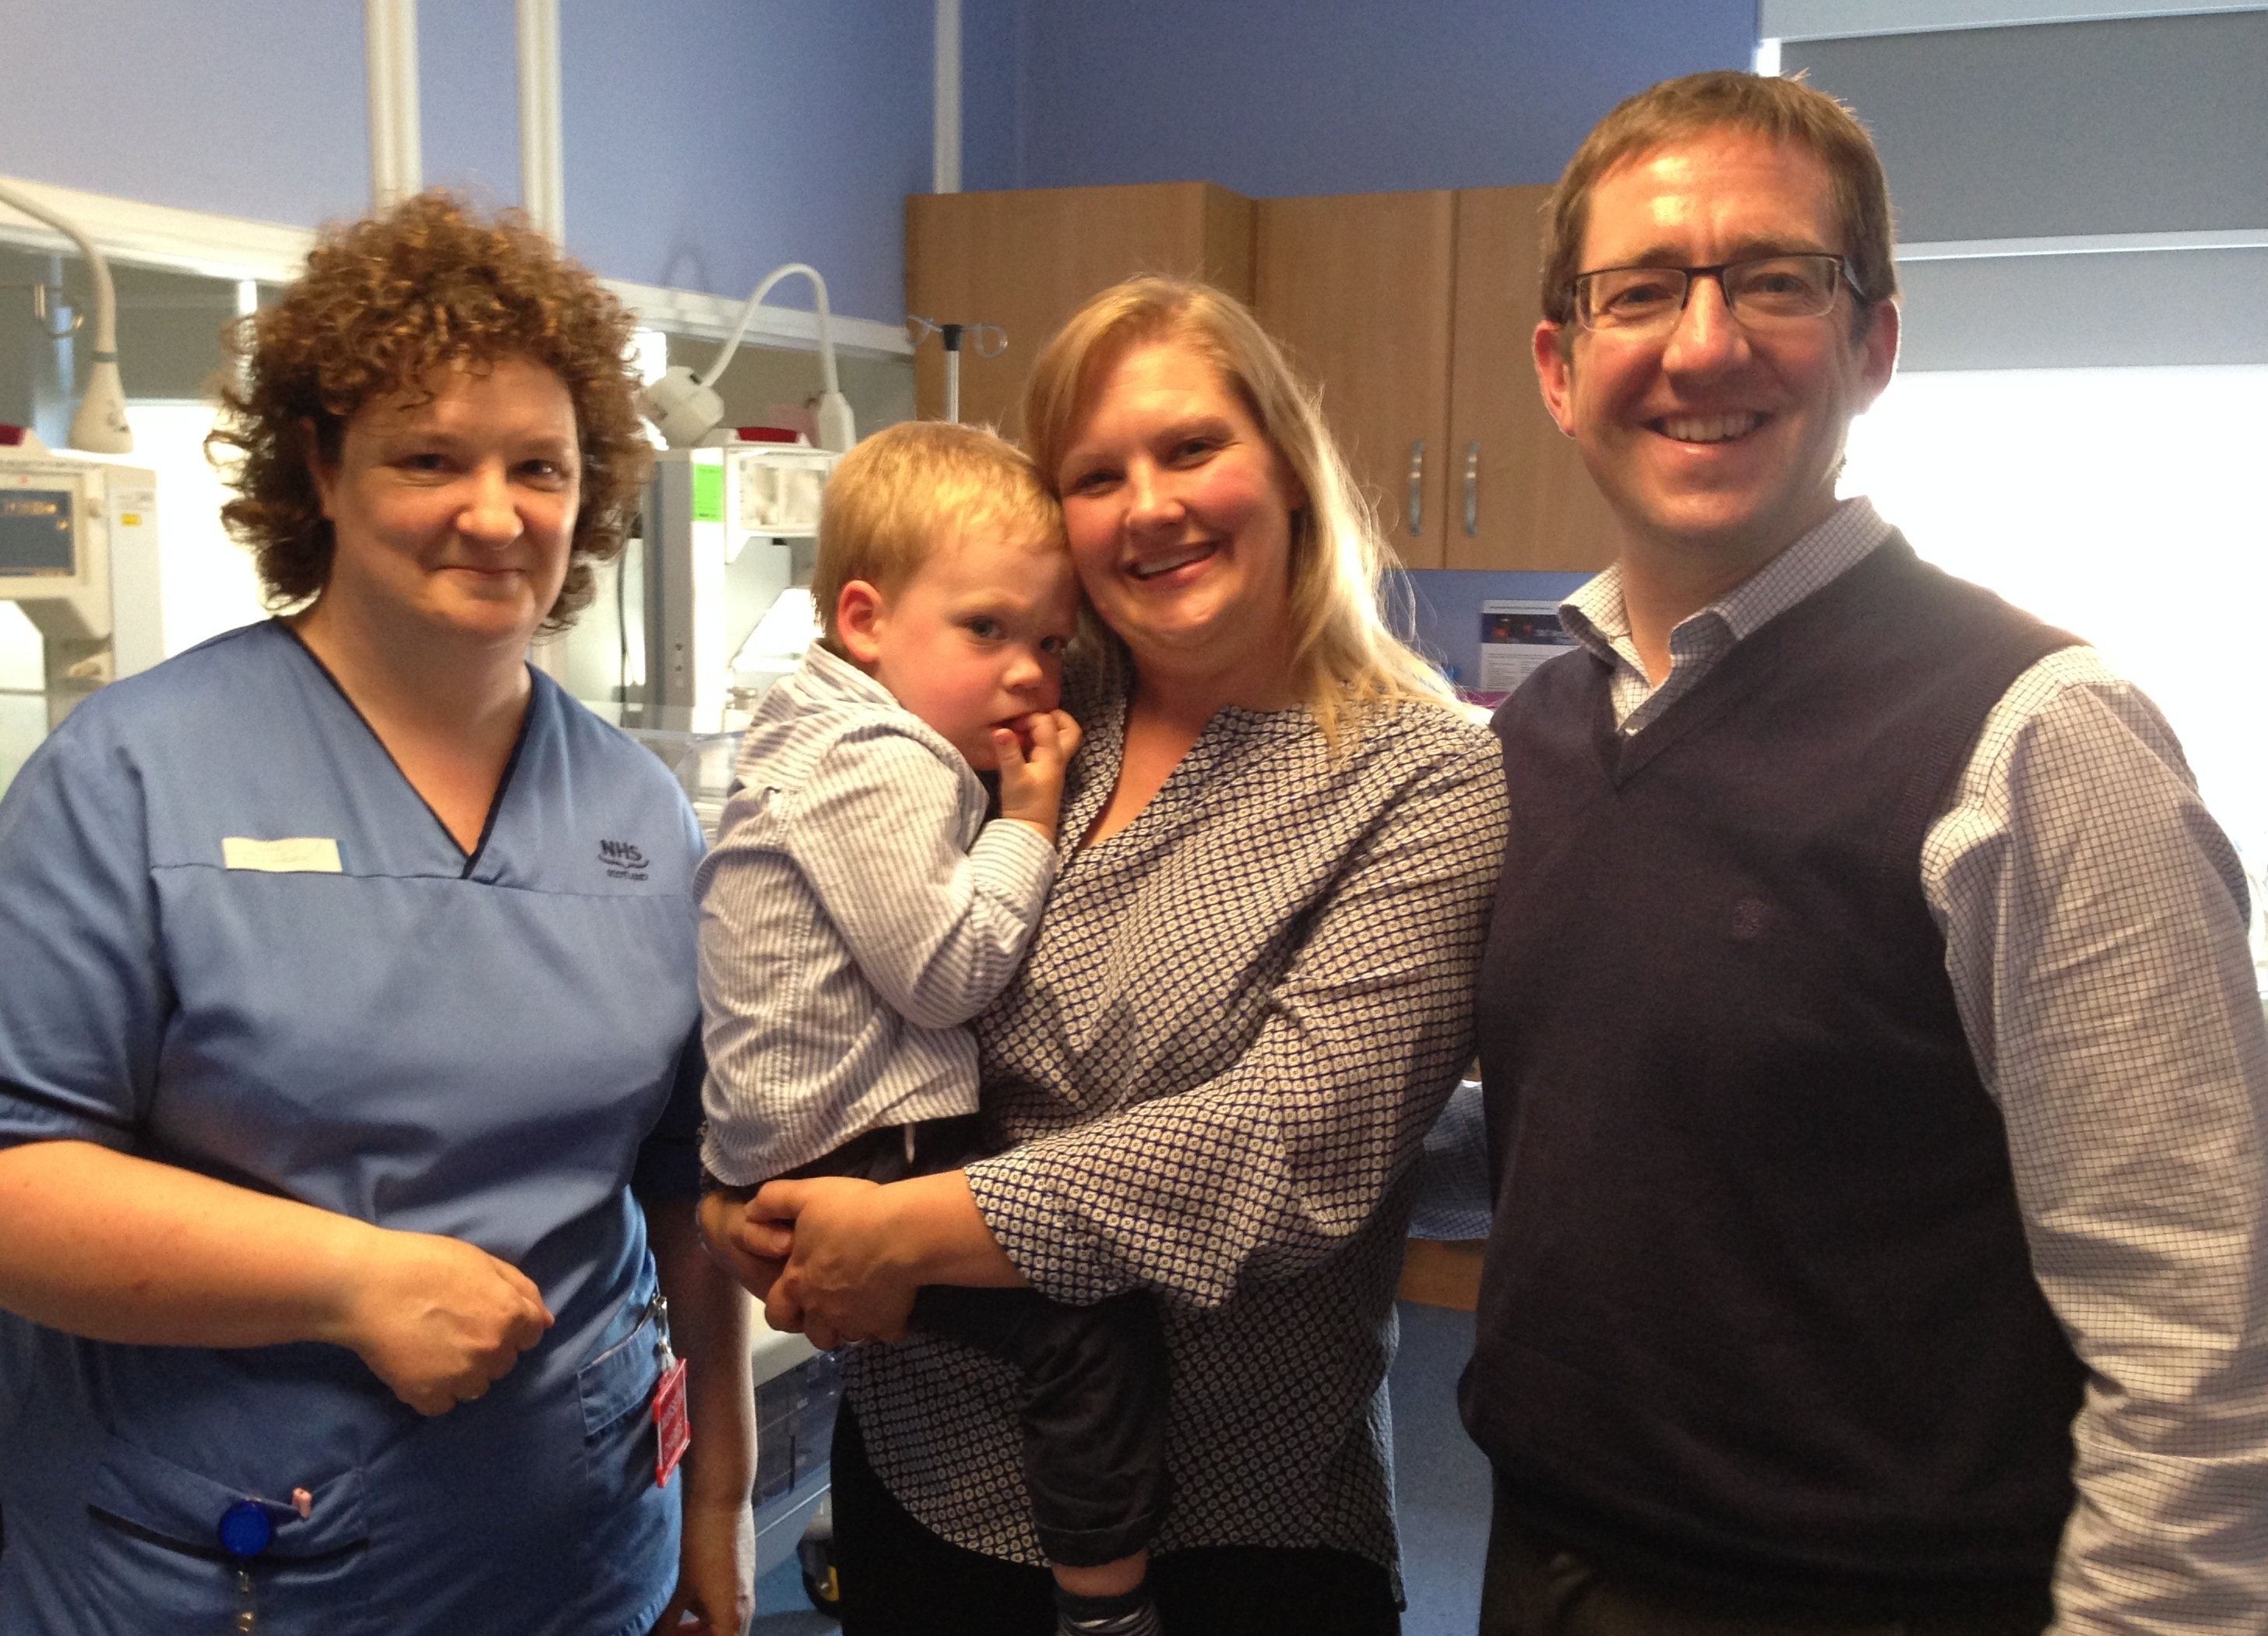 Staff midwife Jane Elliot with Alexander, Megan and Alan Mackenzie at SCBU